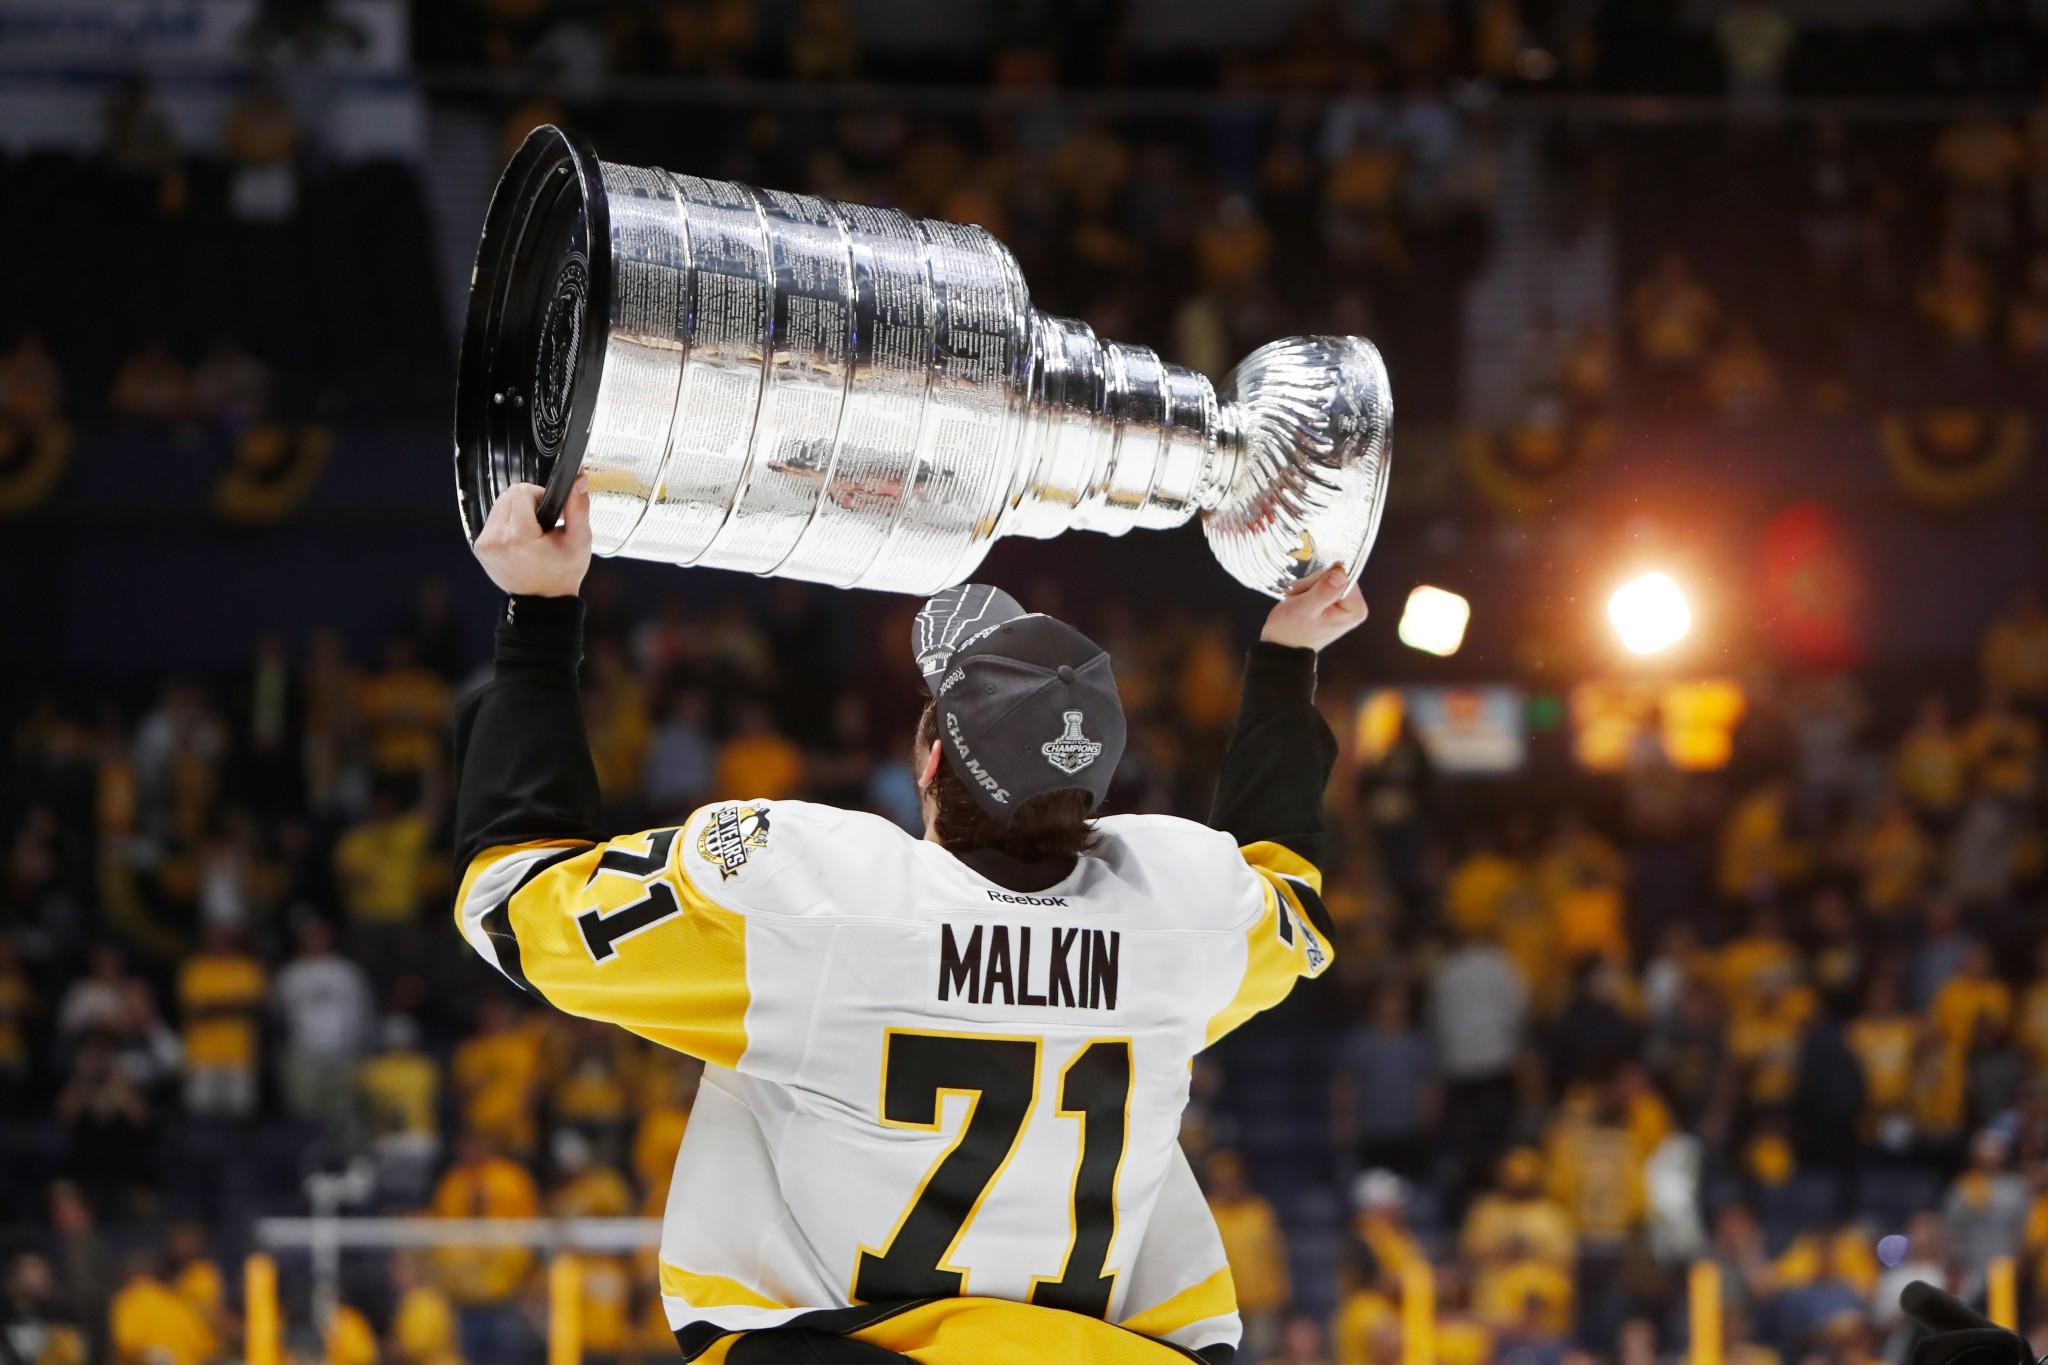 Malkin awarded Kharlamov Trophy for best Russian ice hockey player